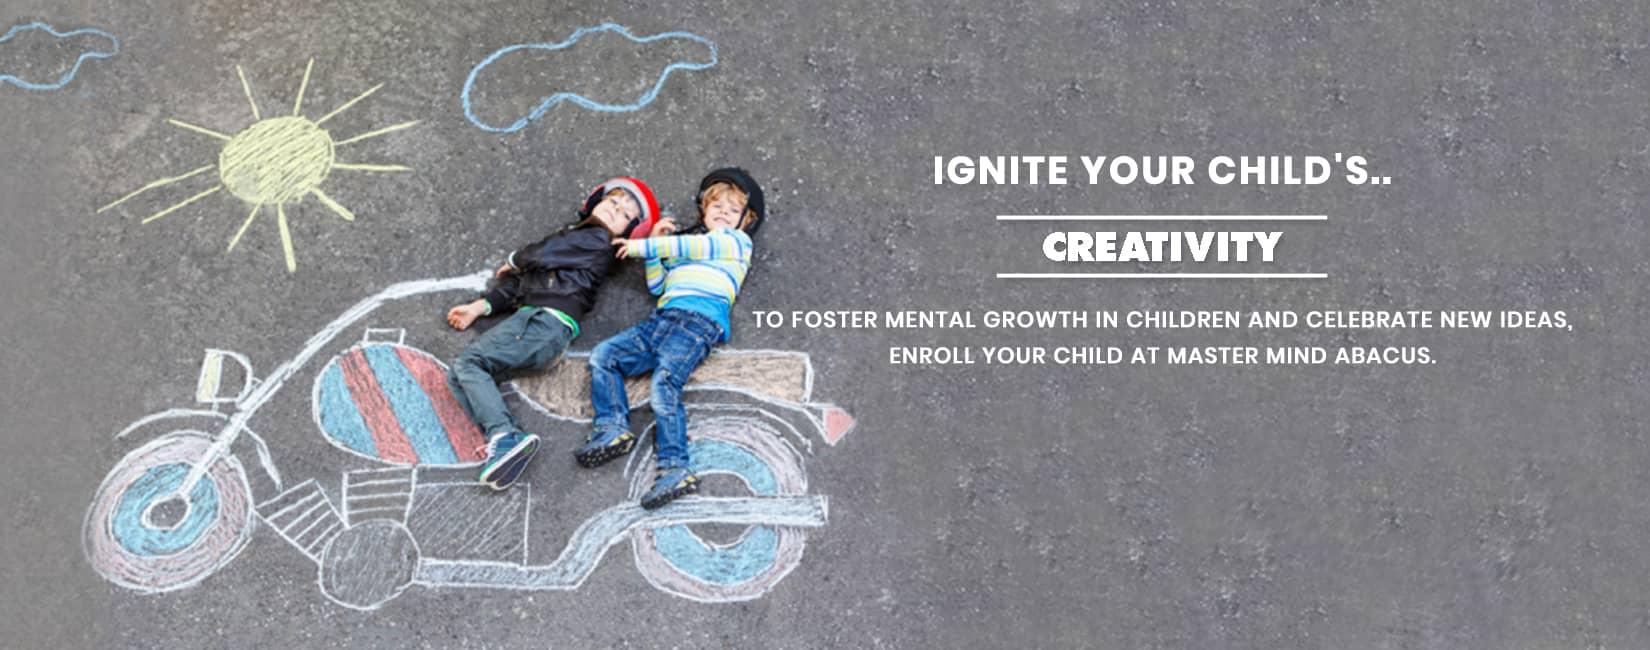 Mastermind-Creativity